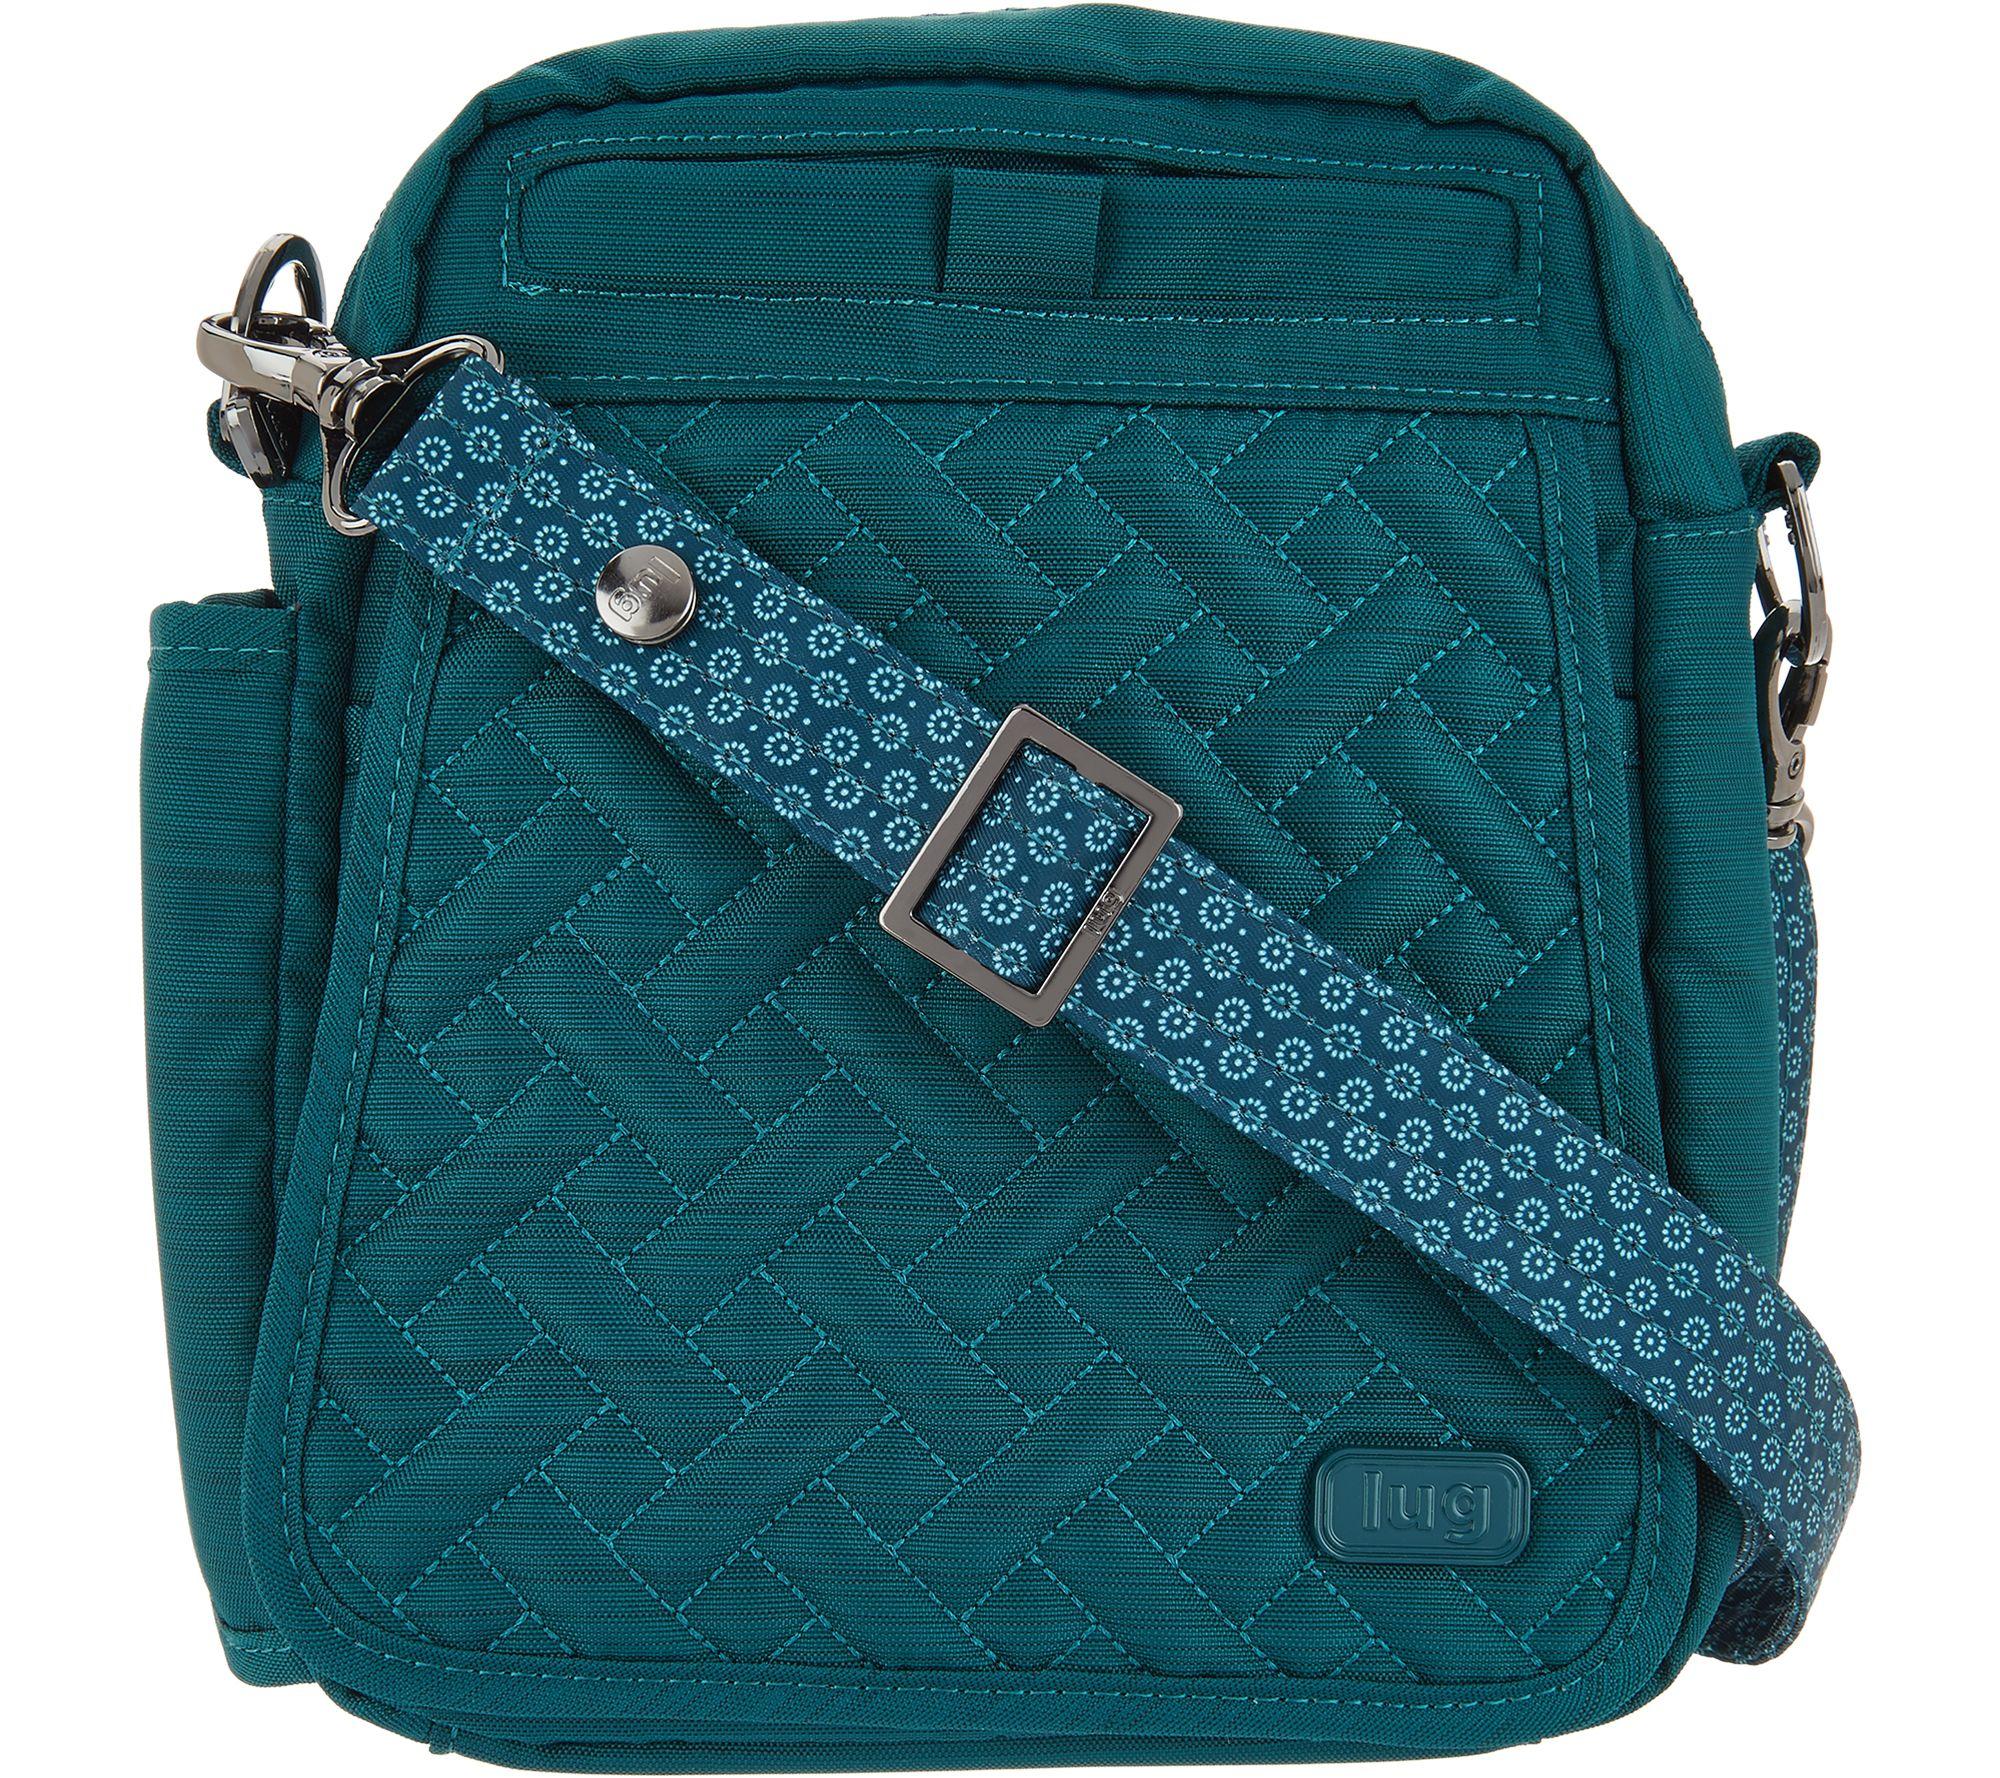 e8f63a25258b Lug RFID Convertible Crossbody Bag w  Bonus Strap - Flapper - Page 1 ...